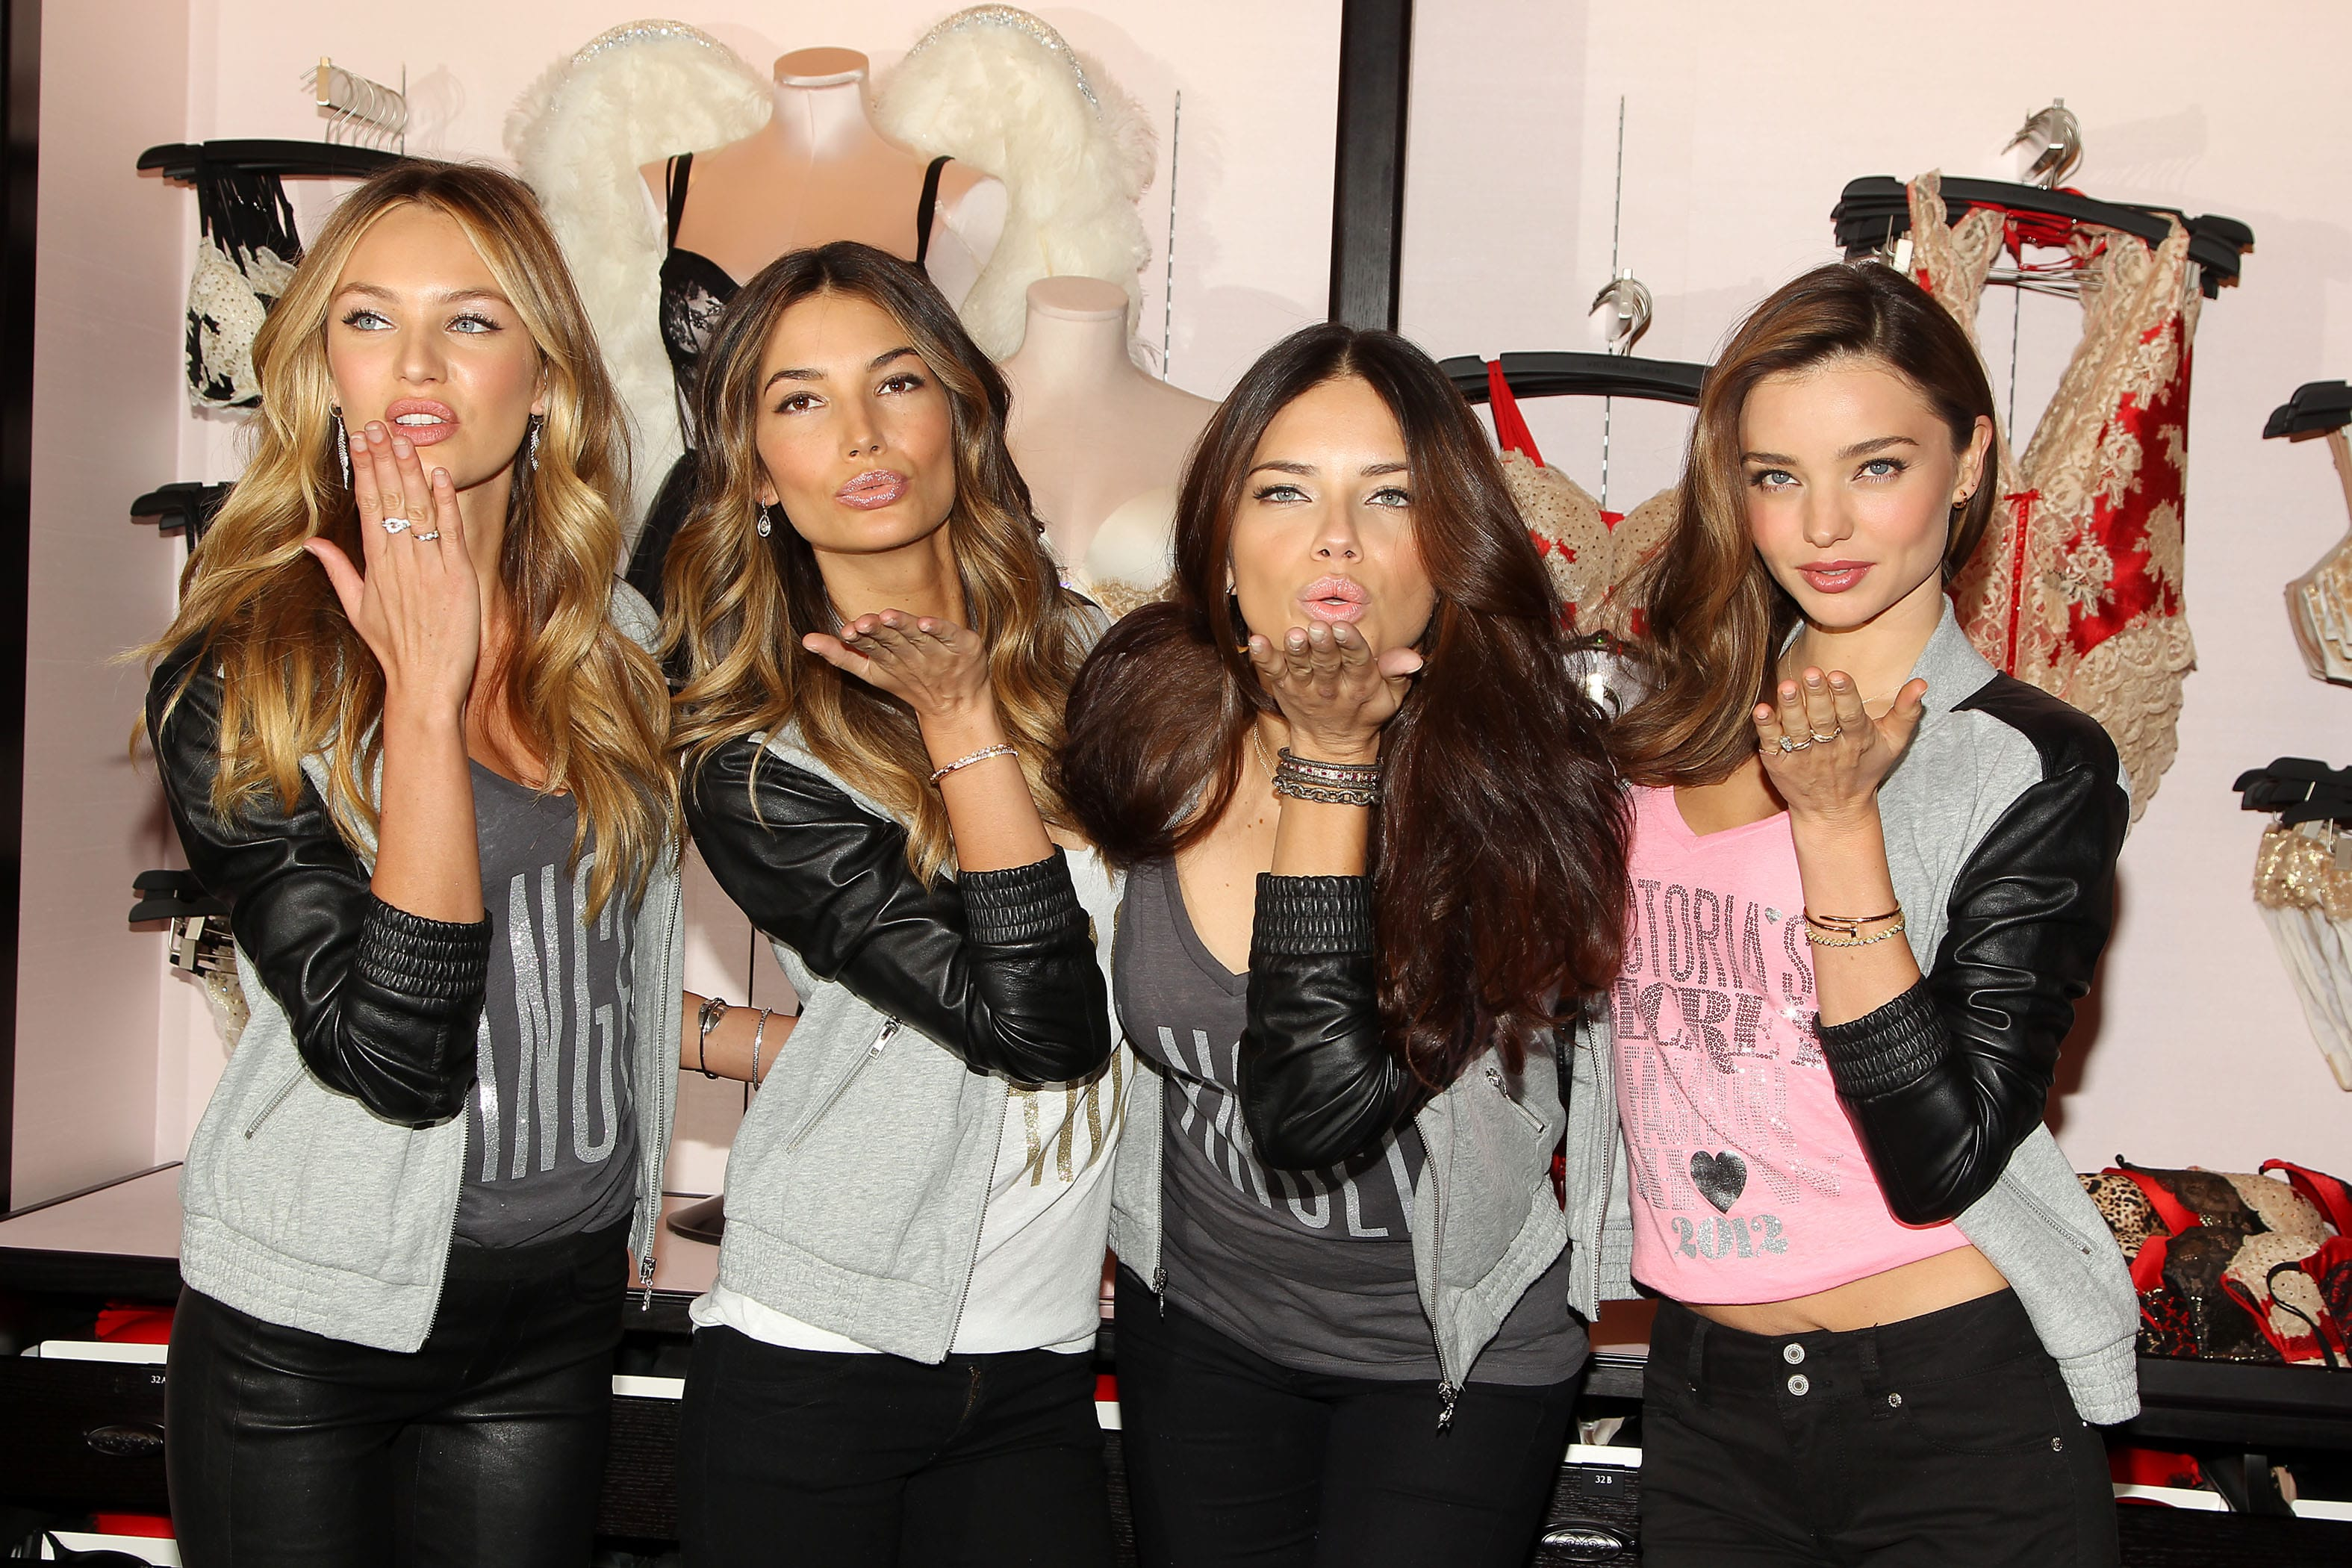 Candice Swanepoel, Lily Aldridge, Adriana Lima, Miranda Kerr